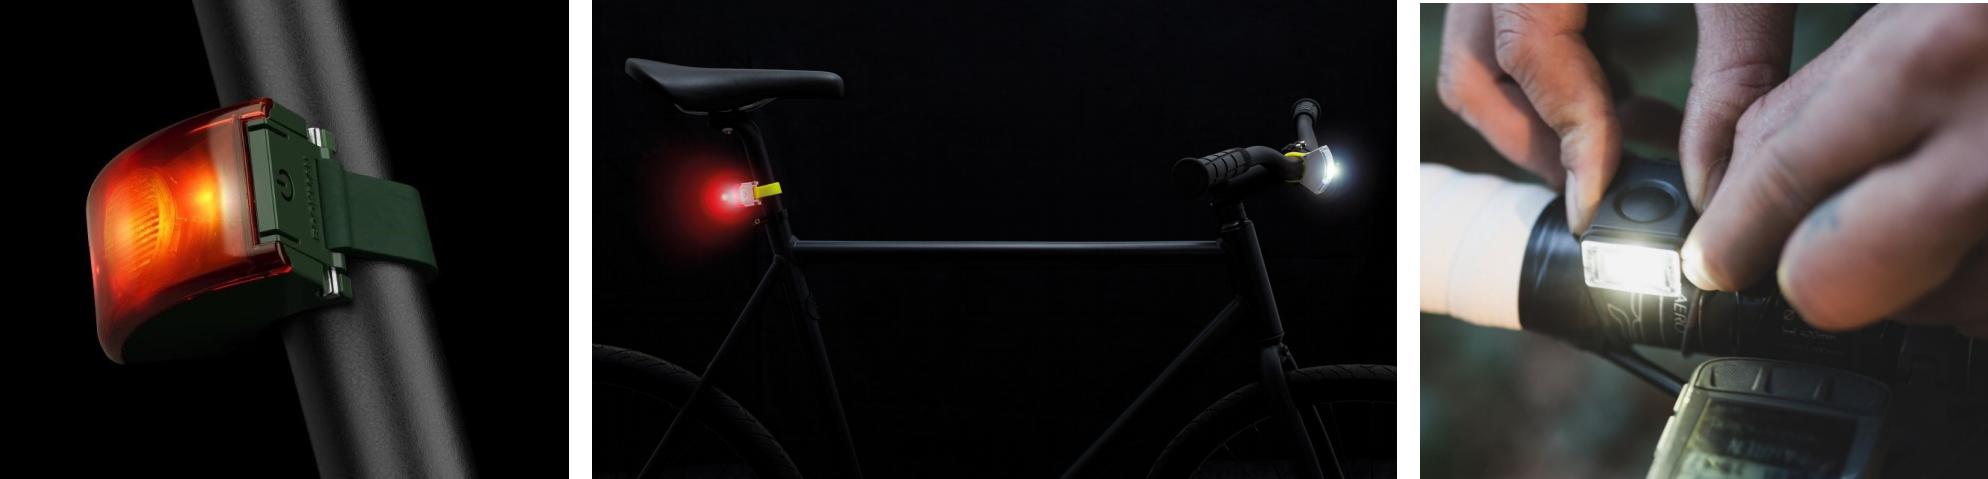 USB oplaadbare fietsverlichting Bookman